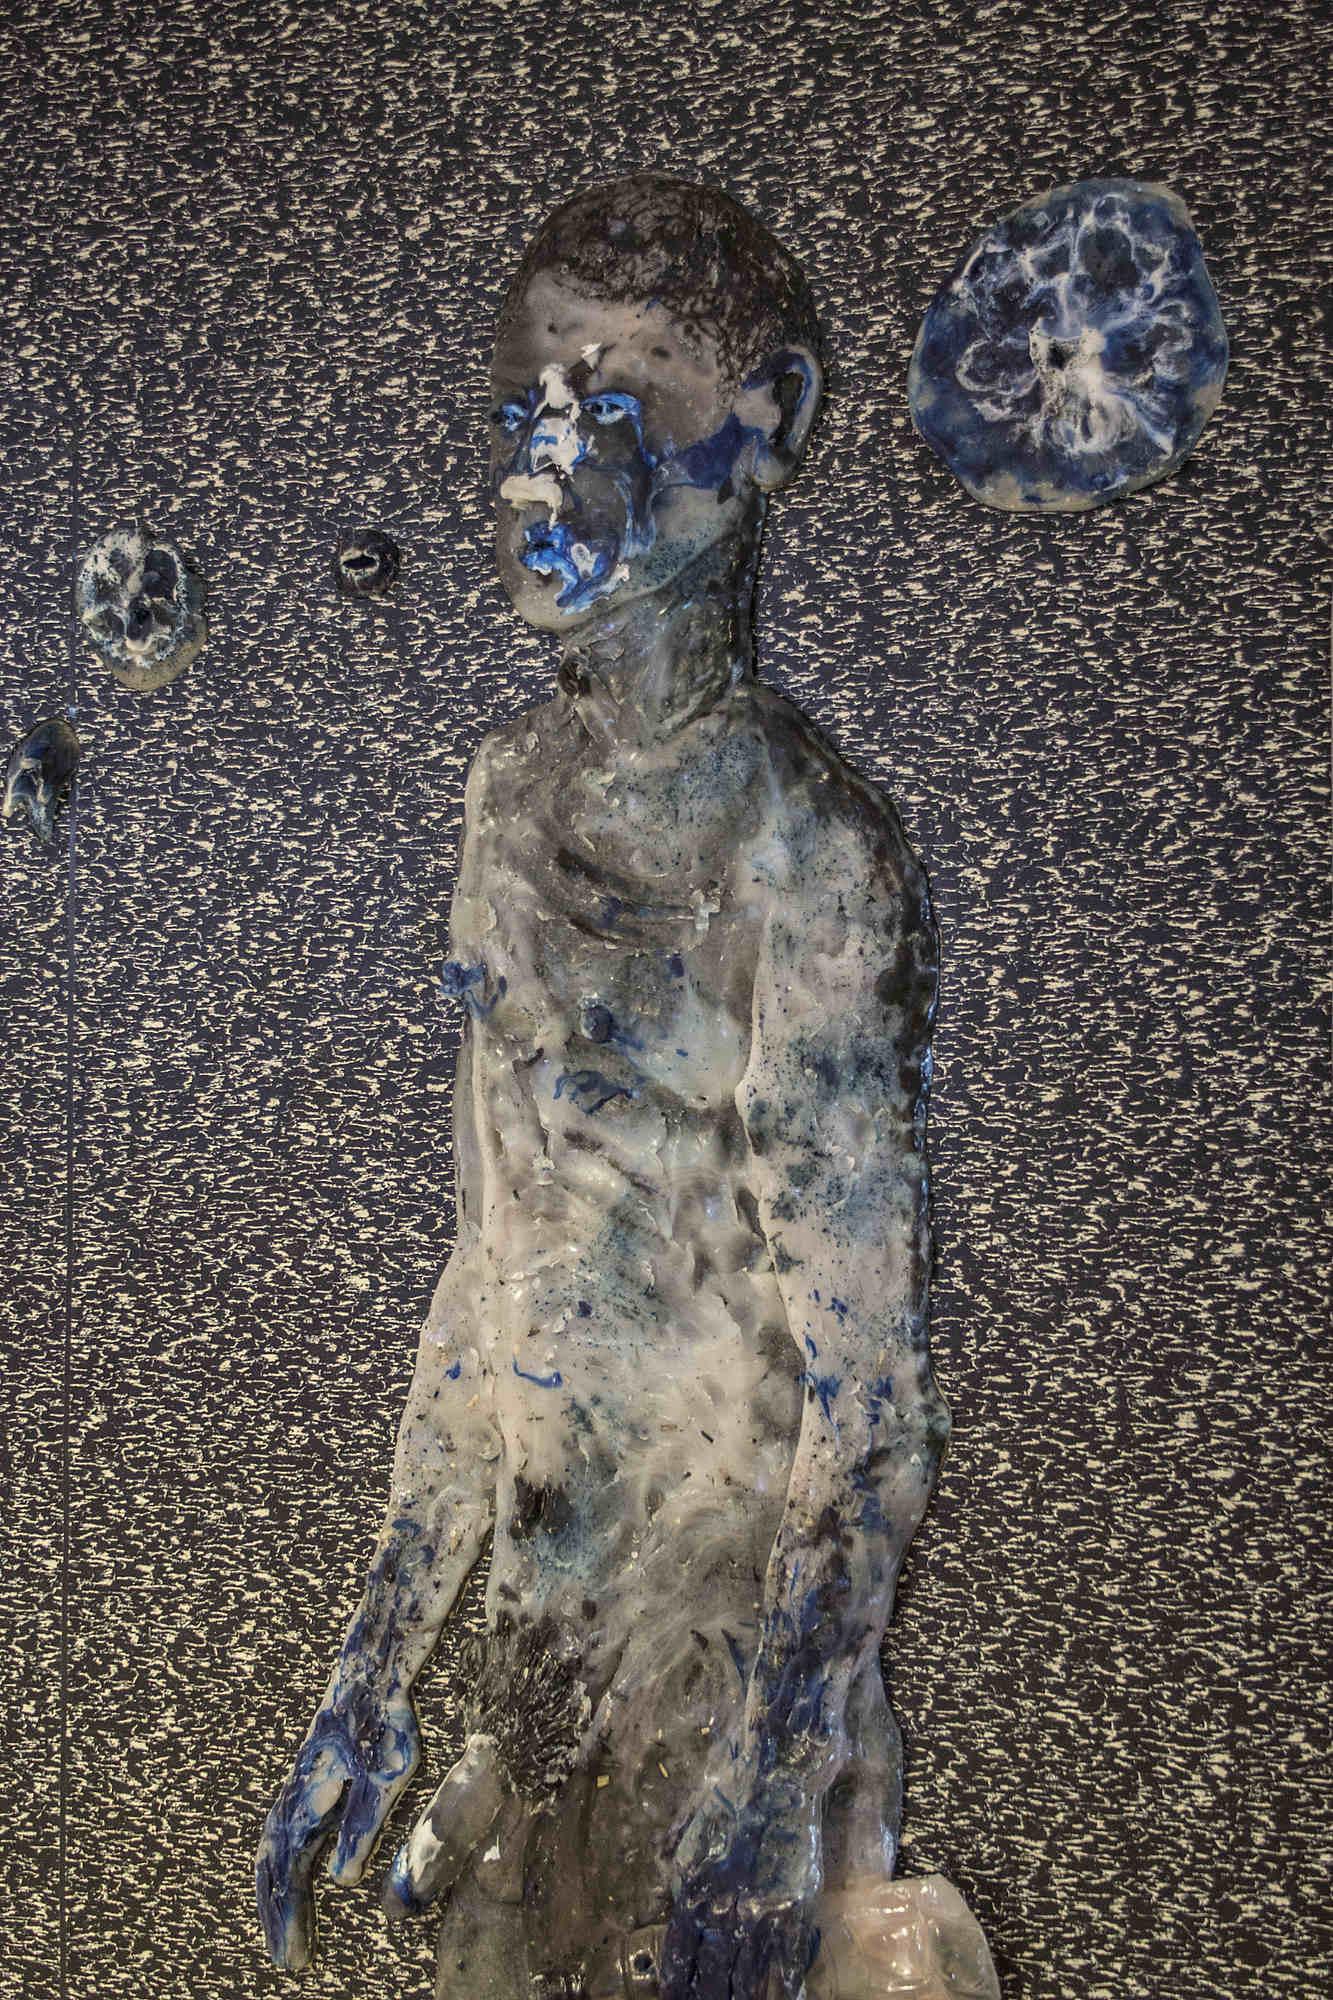 15.Aline Bouvy, Rub Soredetail